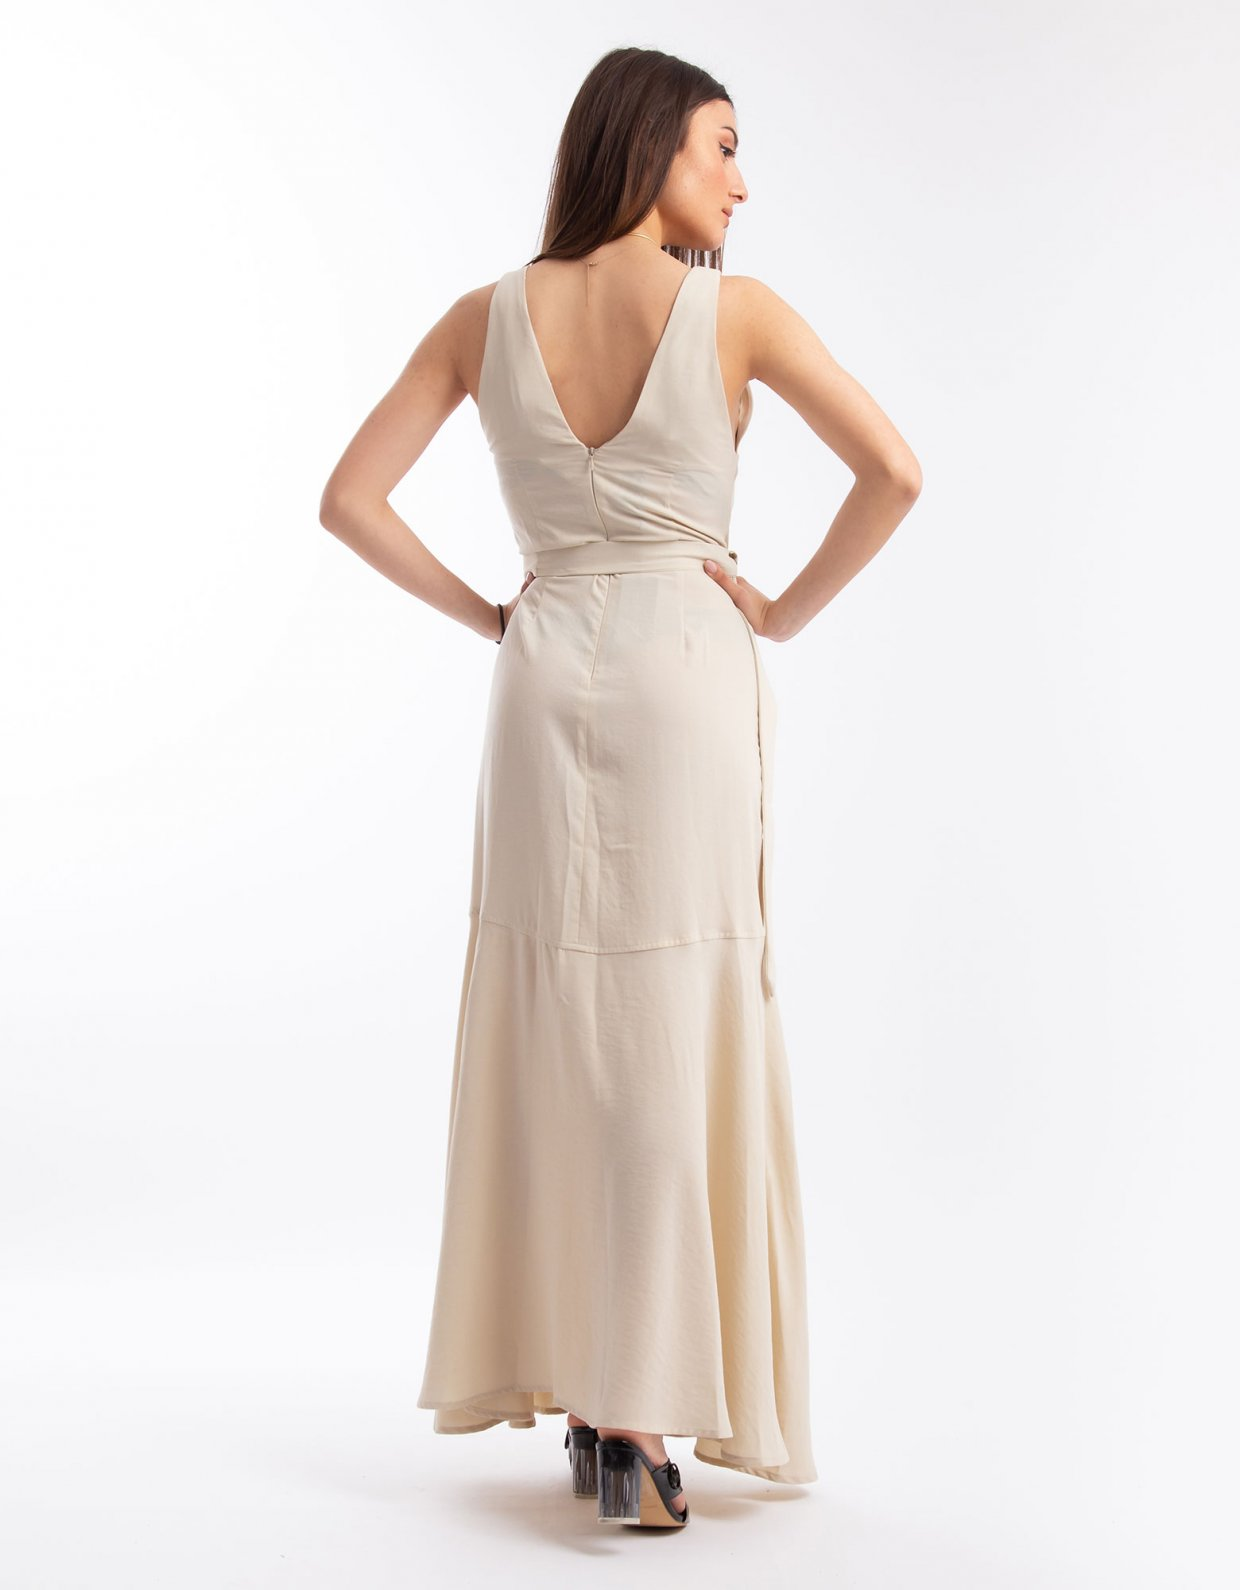 Nadia Rapti Shades of Sahara beige dress